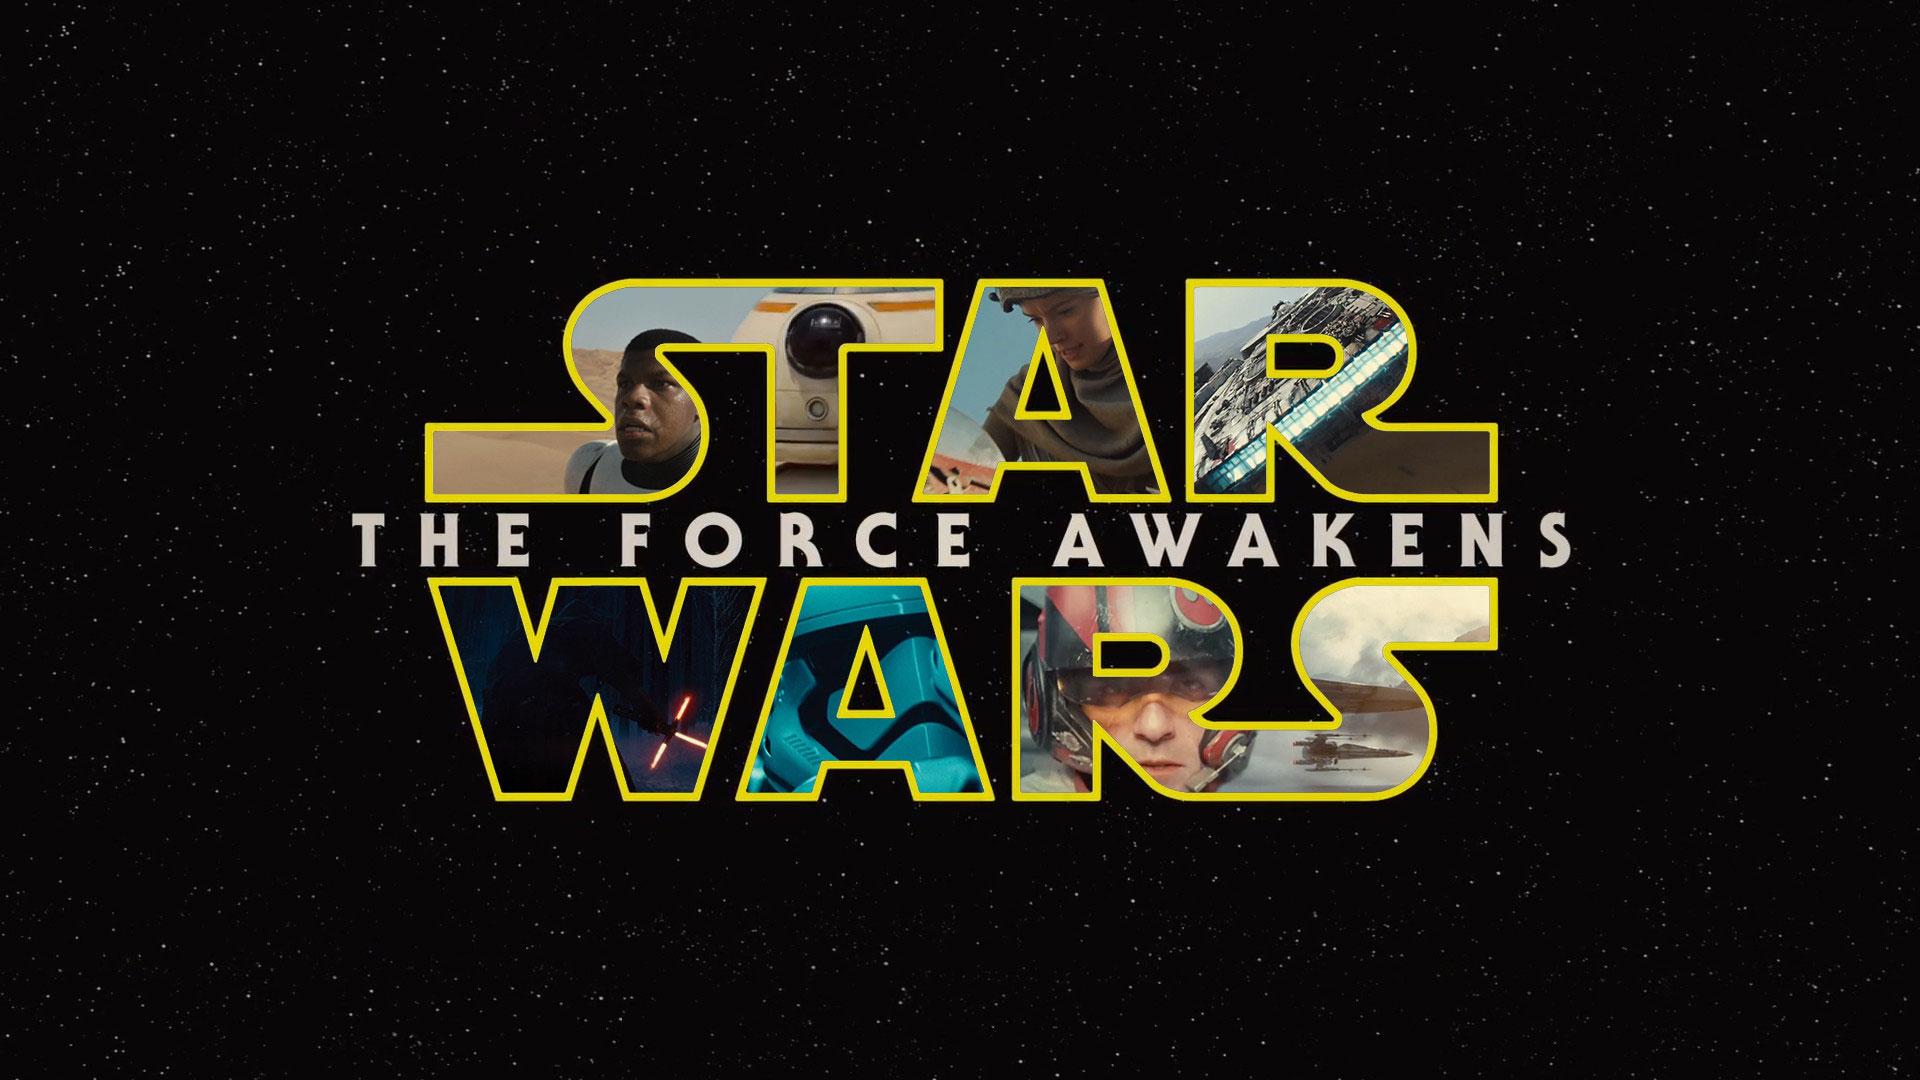 Star Wars the Force Awakens wallpaper 12